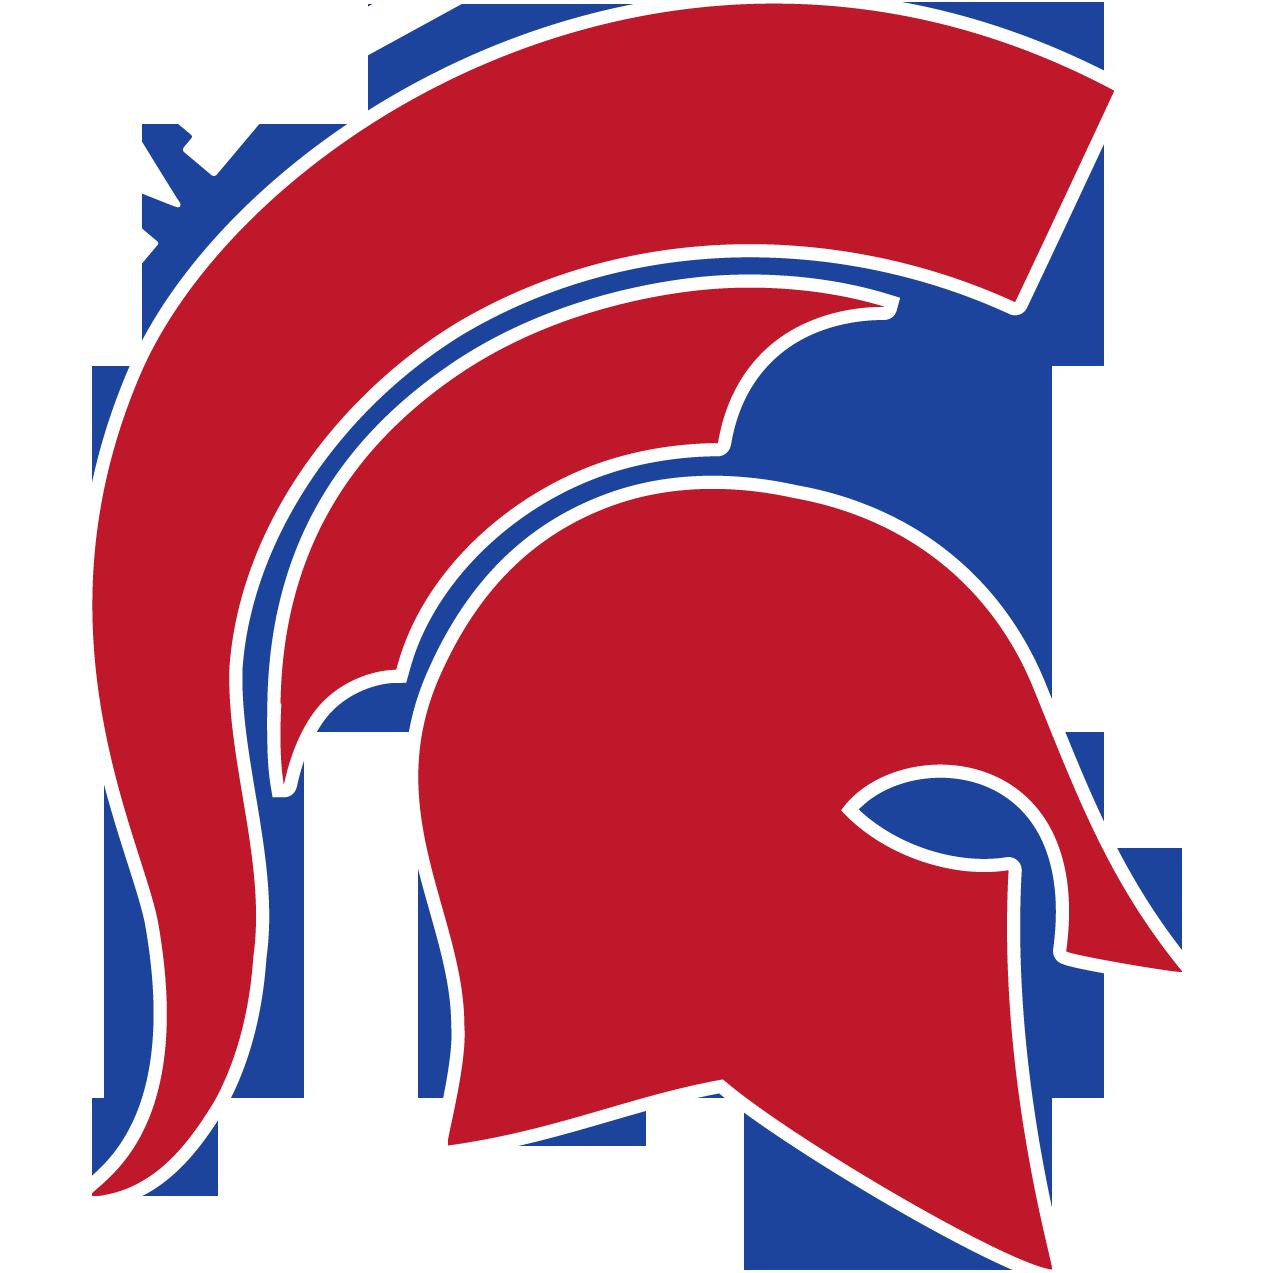 Spartan clipart ancient. Helmet logos